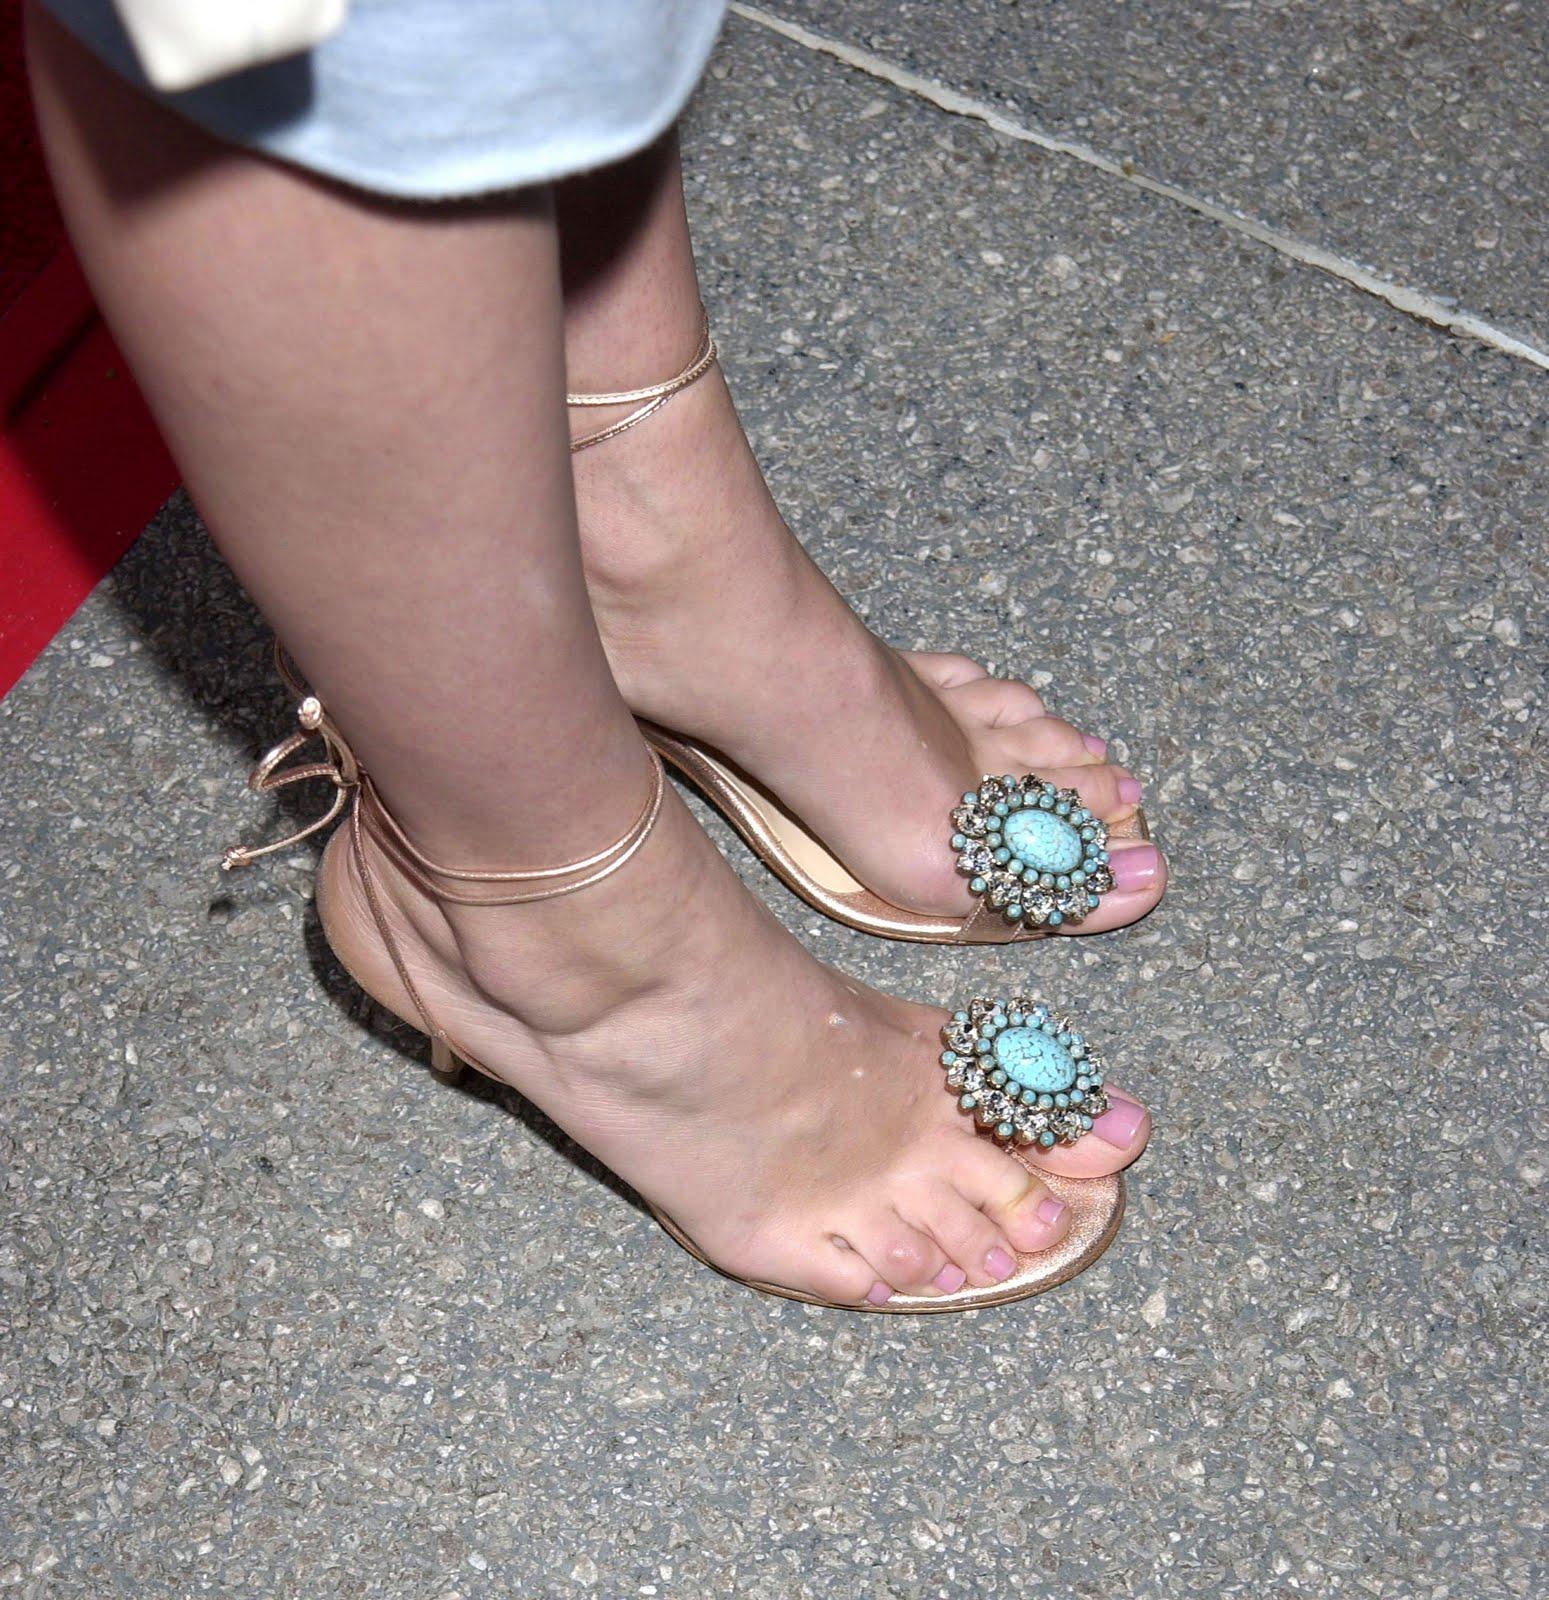 http://4.bp.blogspot.com/_UaLWp72nij4/TC0Byezv_II/AAAAAAAAQc8/af_zlwsD4tg/s1600/rebecca-romijn-feet-2.jpg